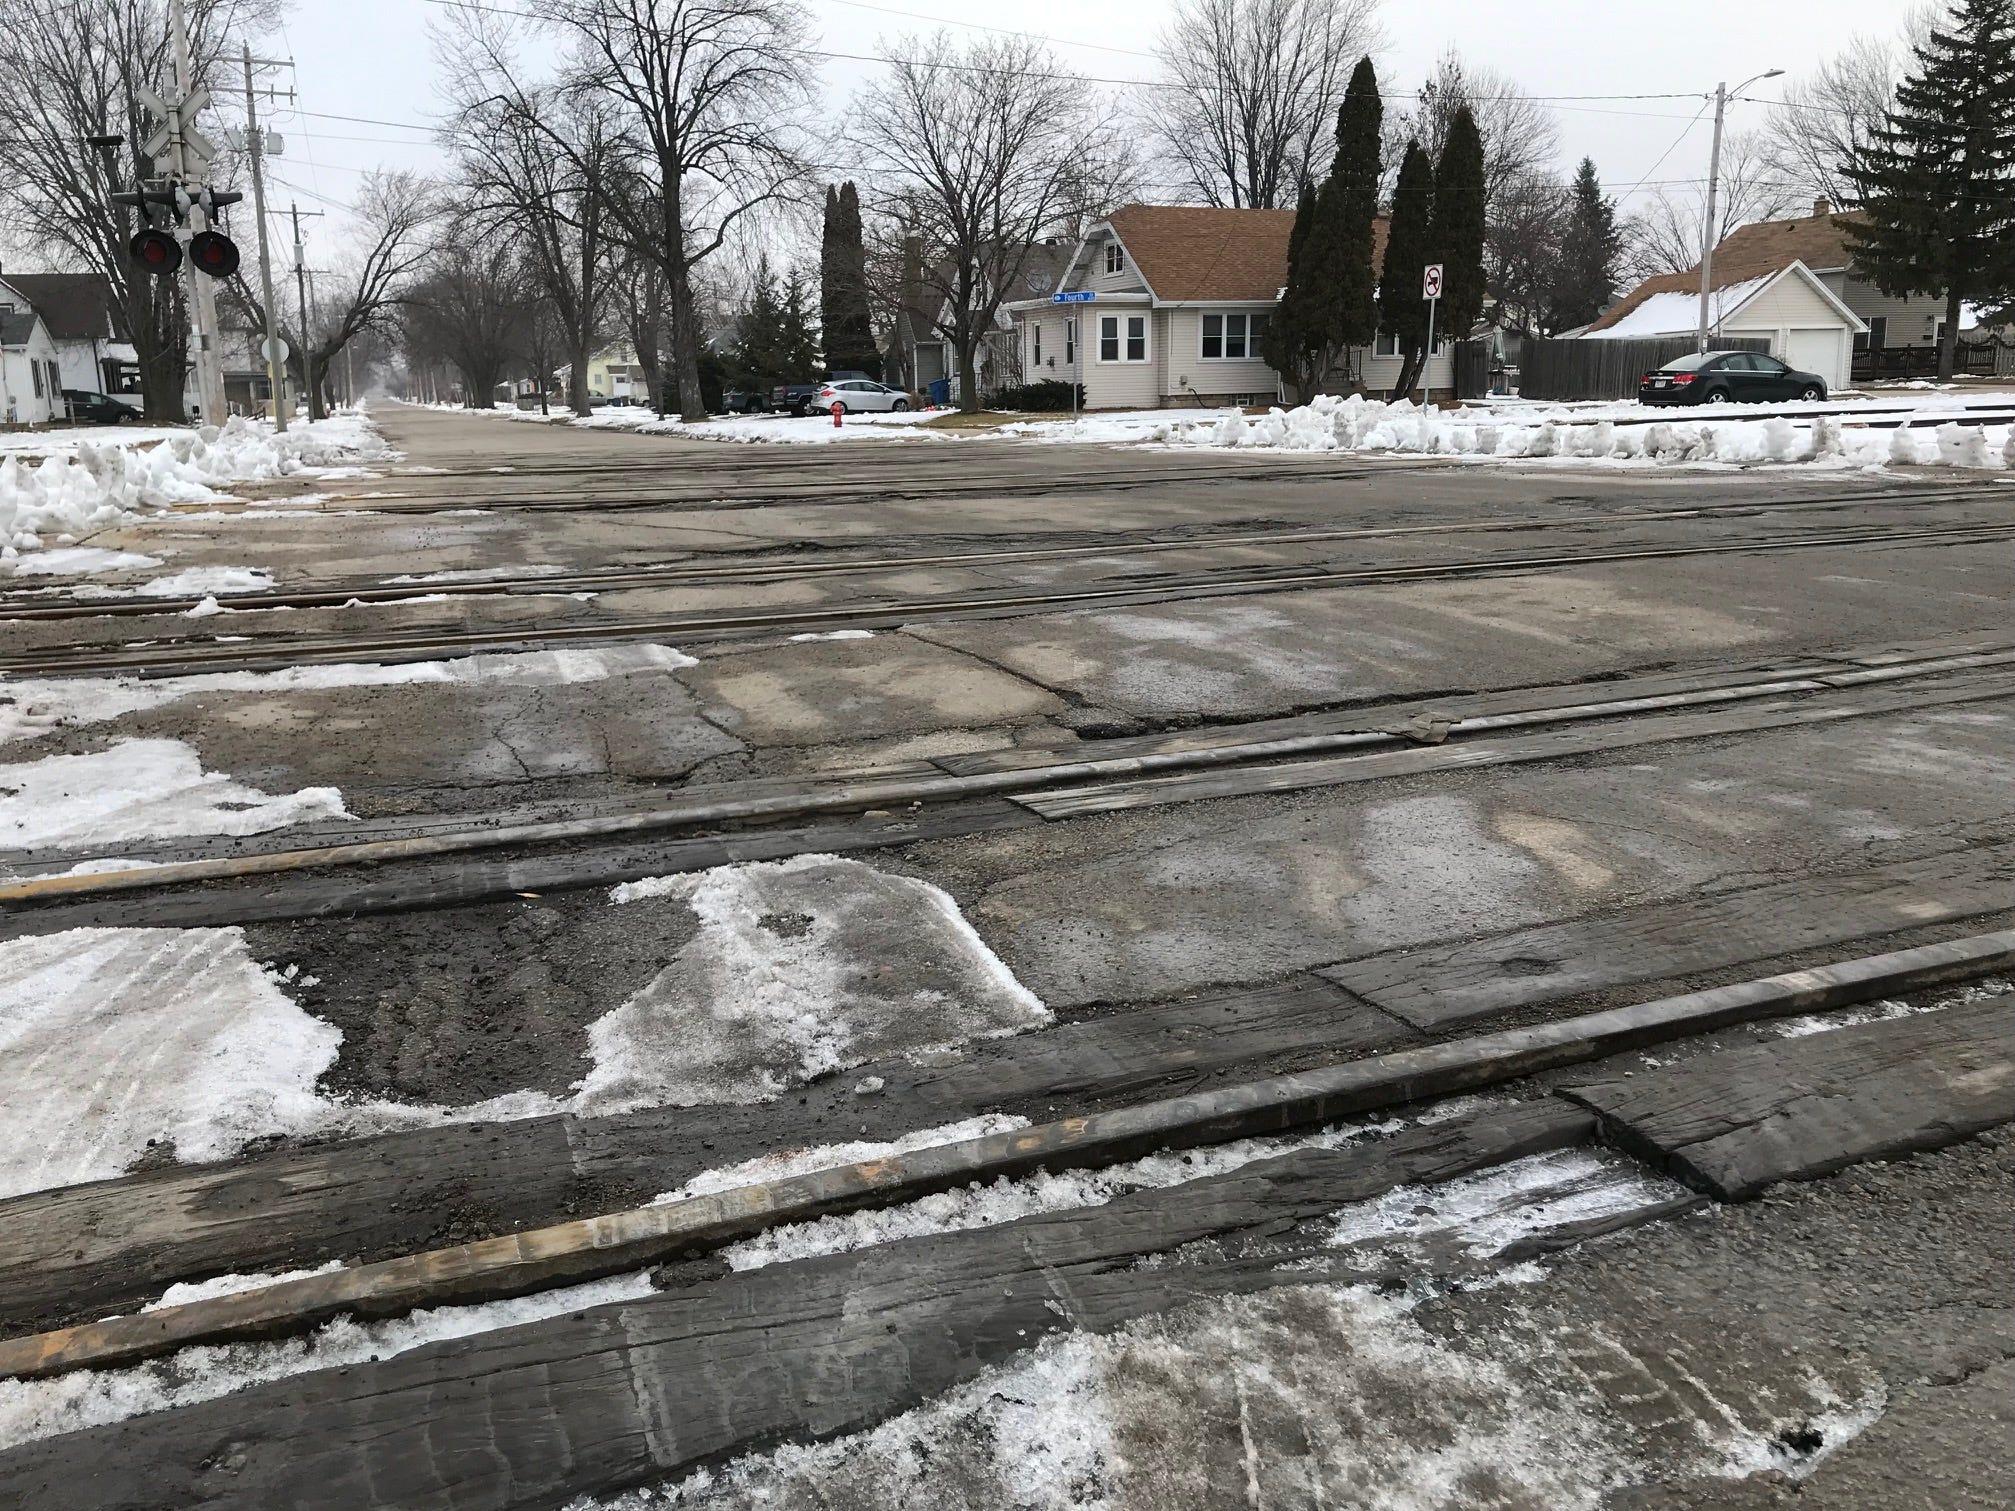 No argument: Menasha agrees that Appleton Street railroad crossing needs repair